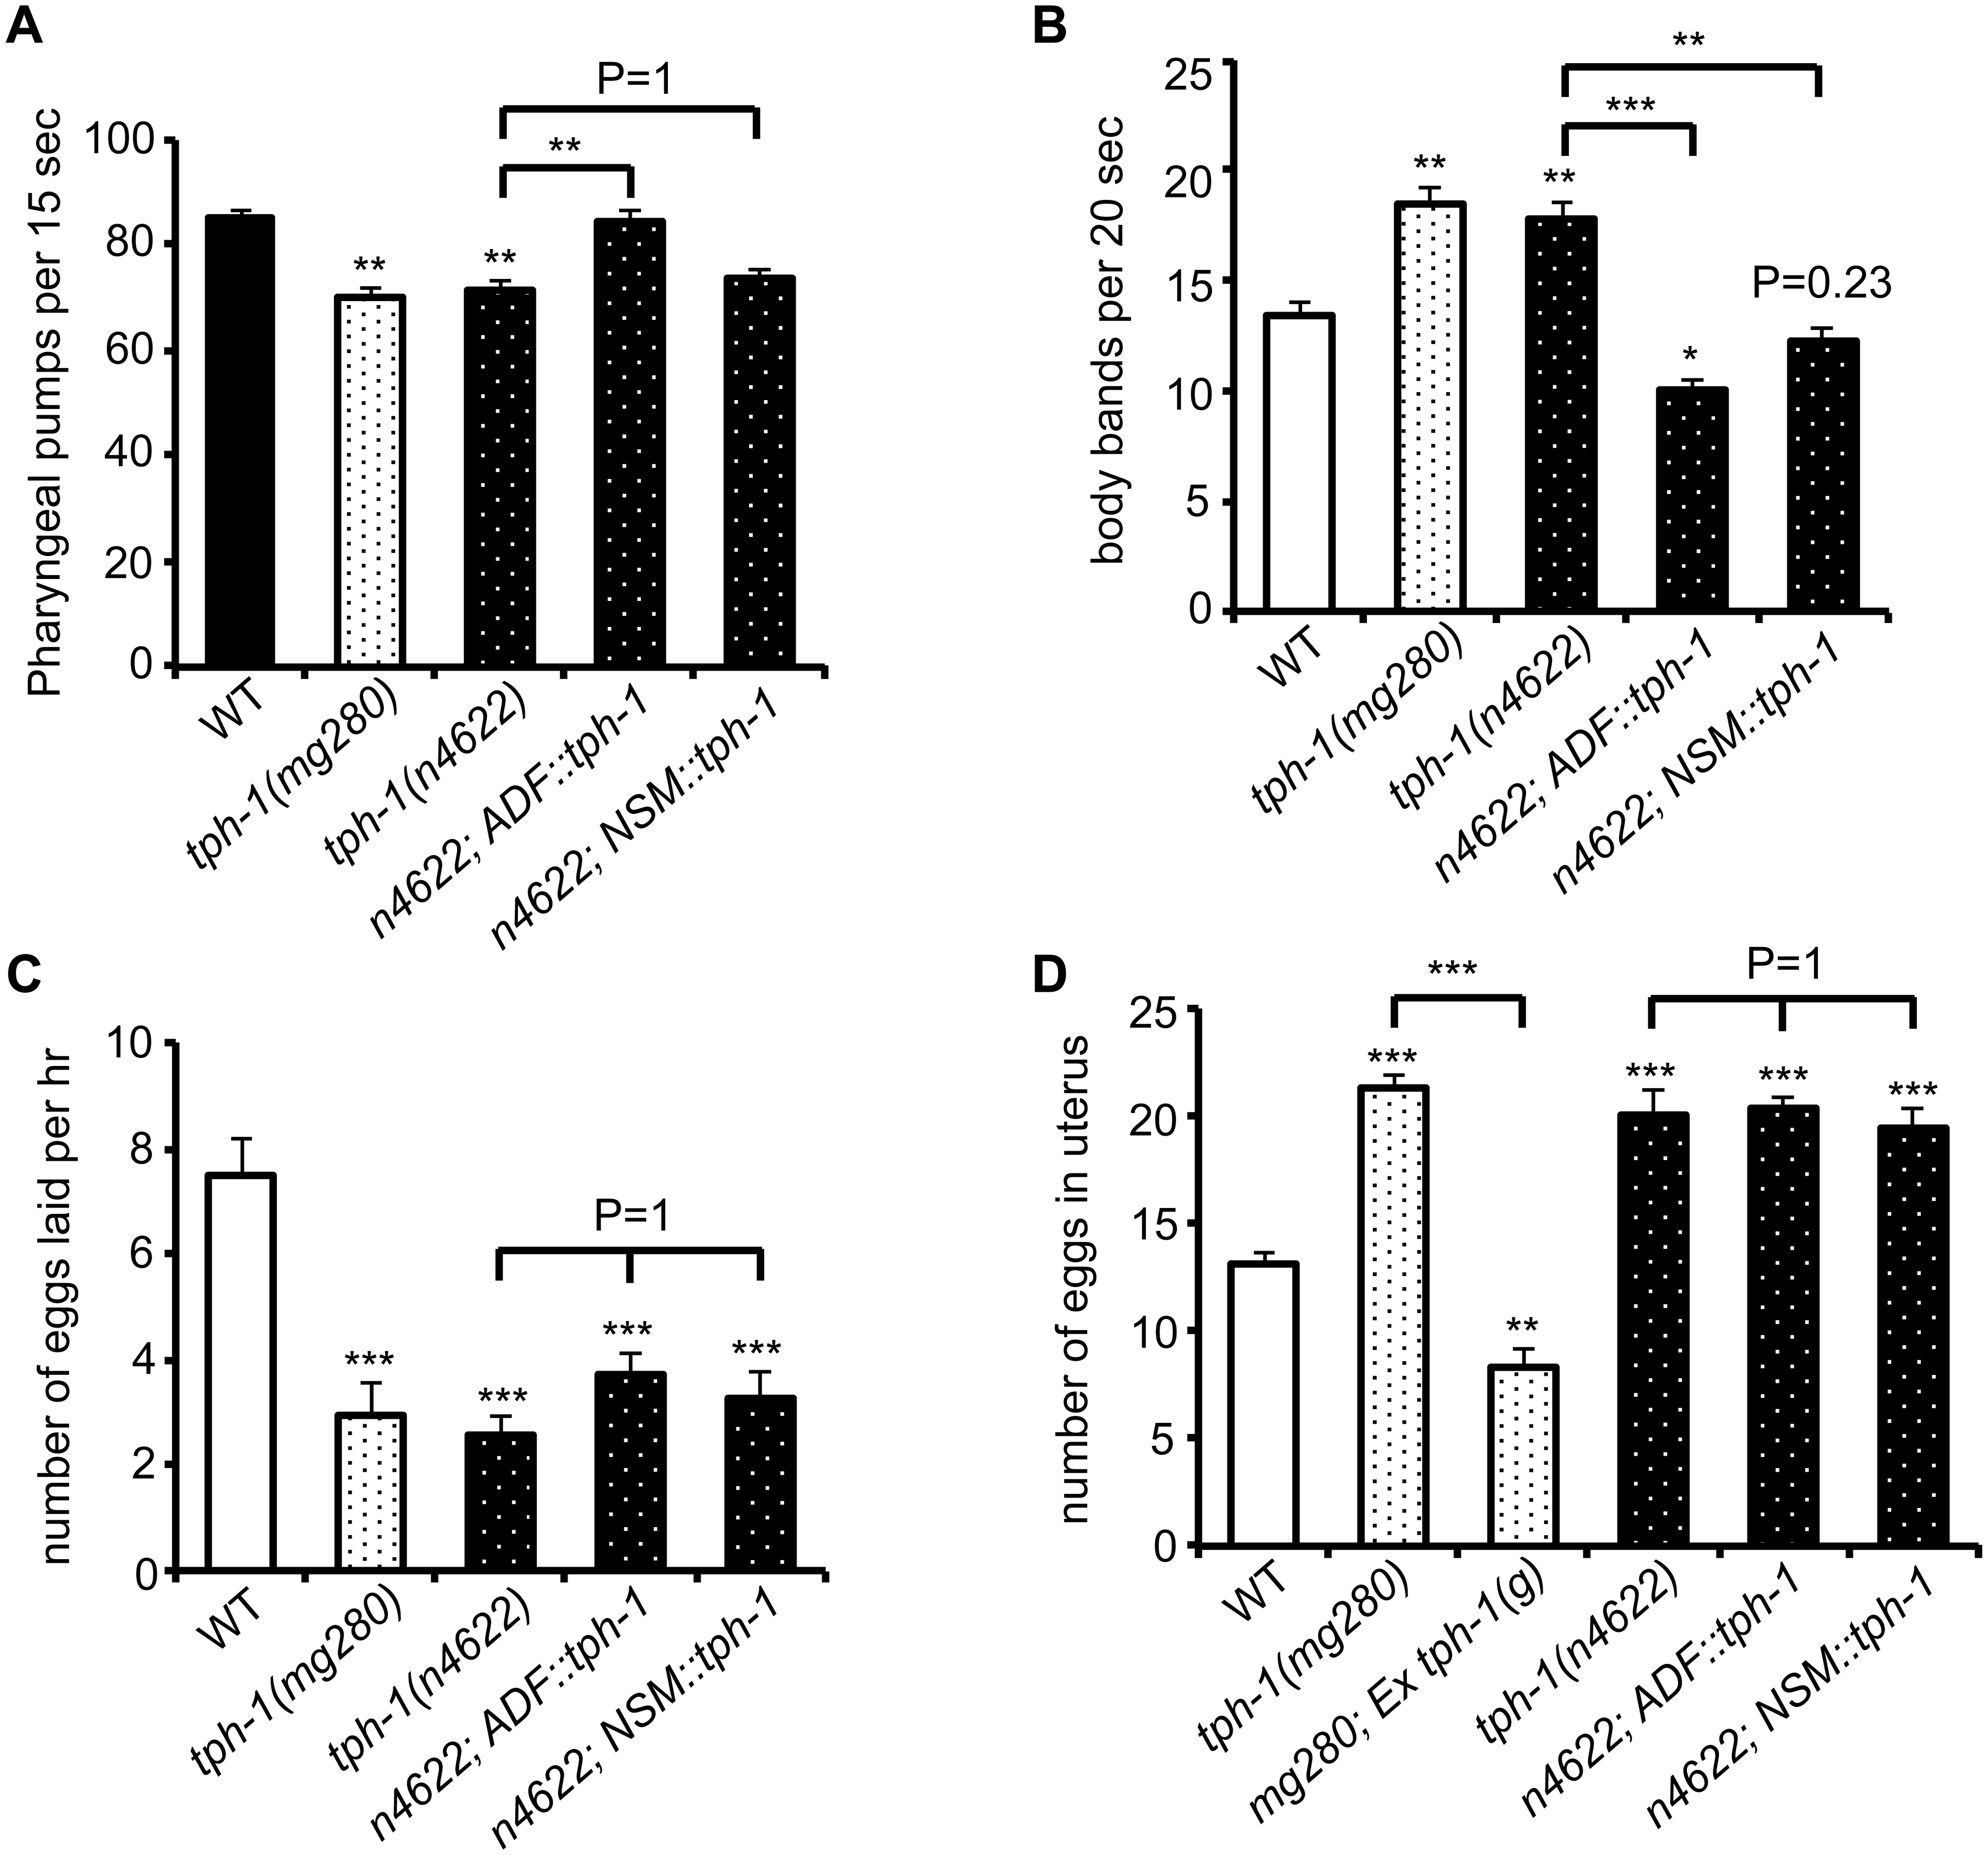 ADF-produced 5-HT modulates specific 5-HT-regulated innate behaviors.